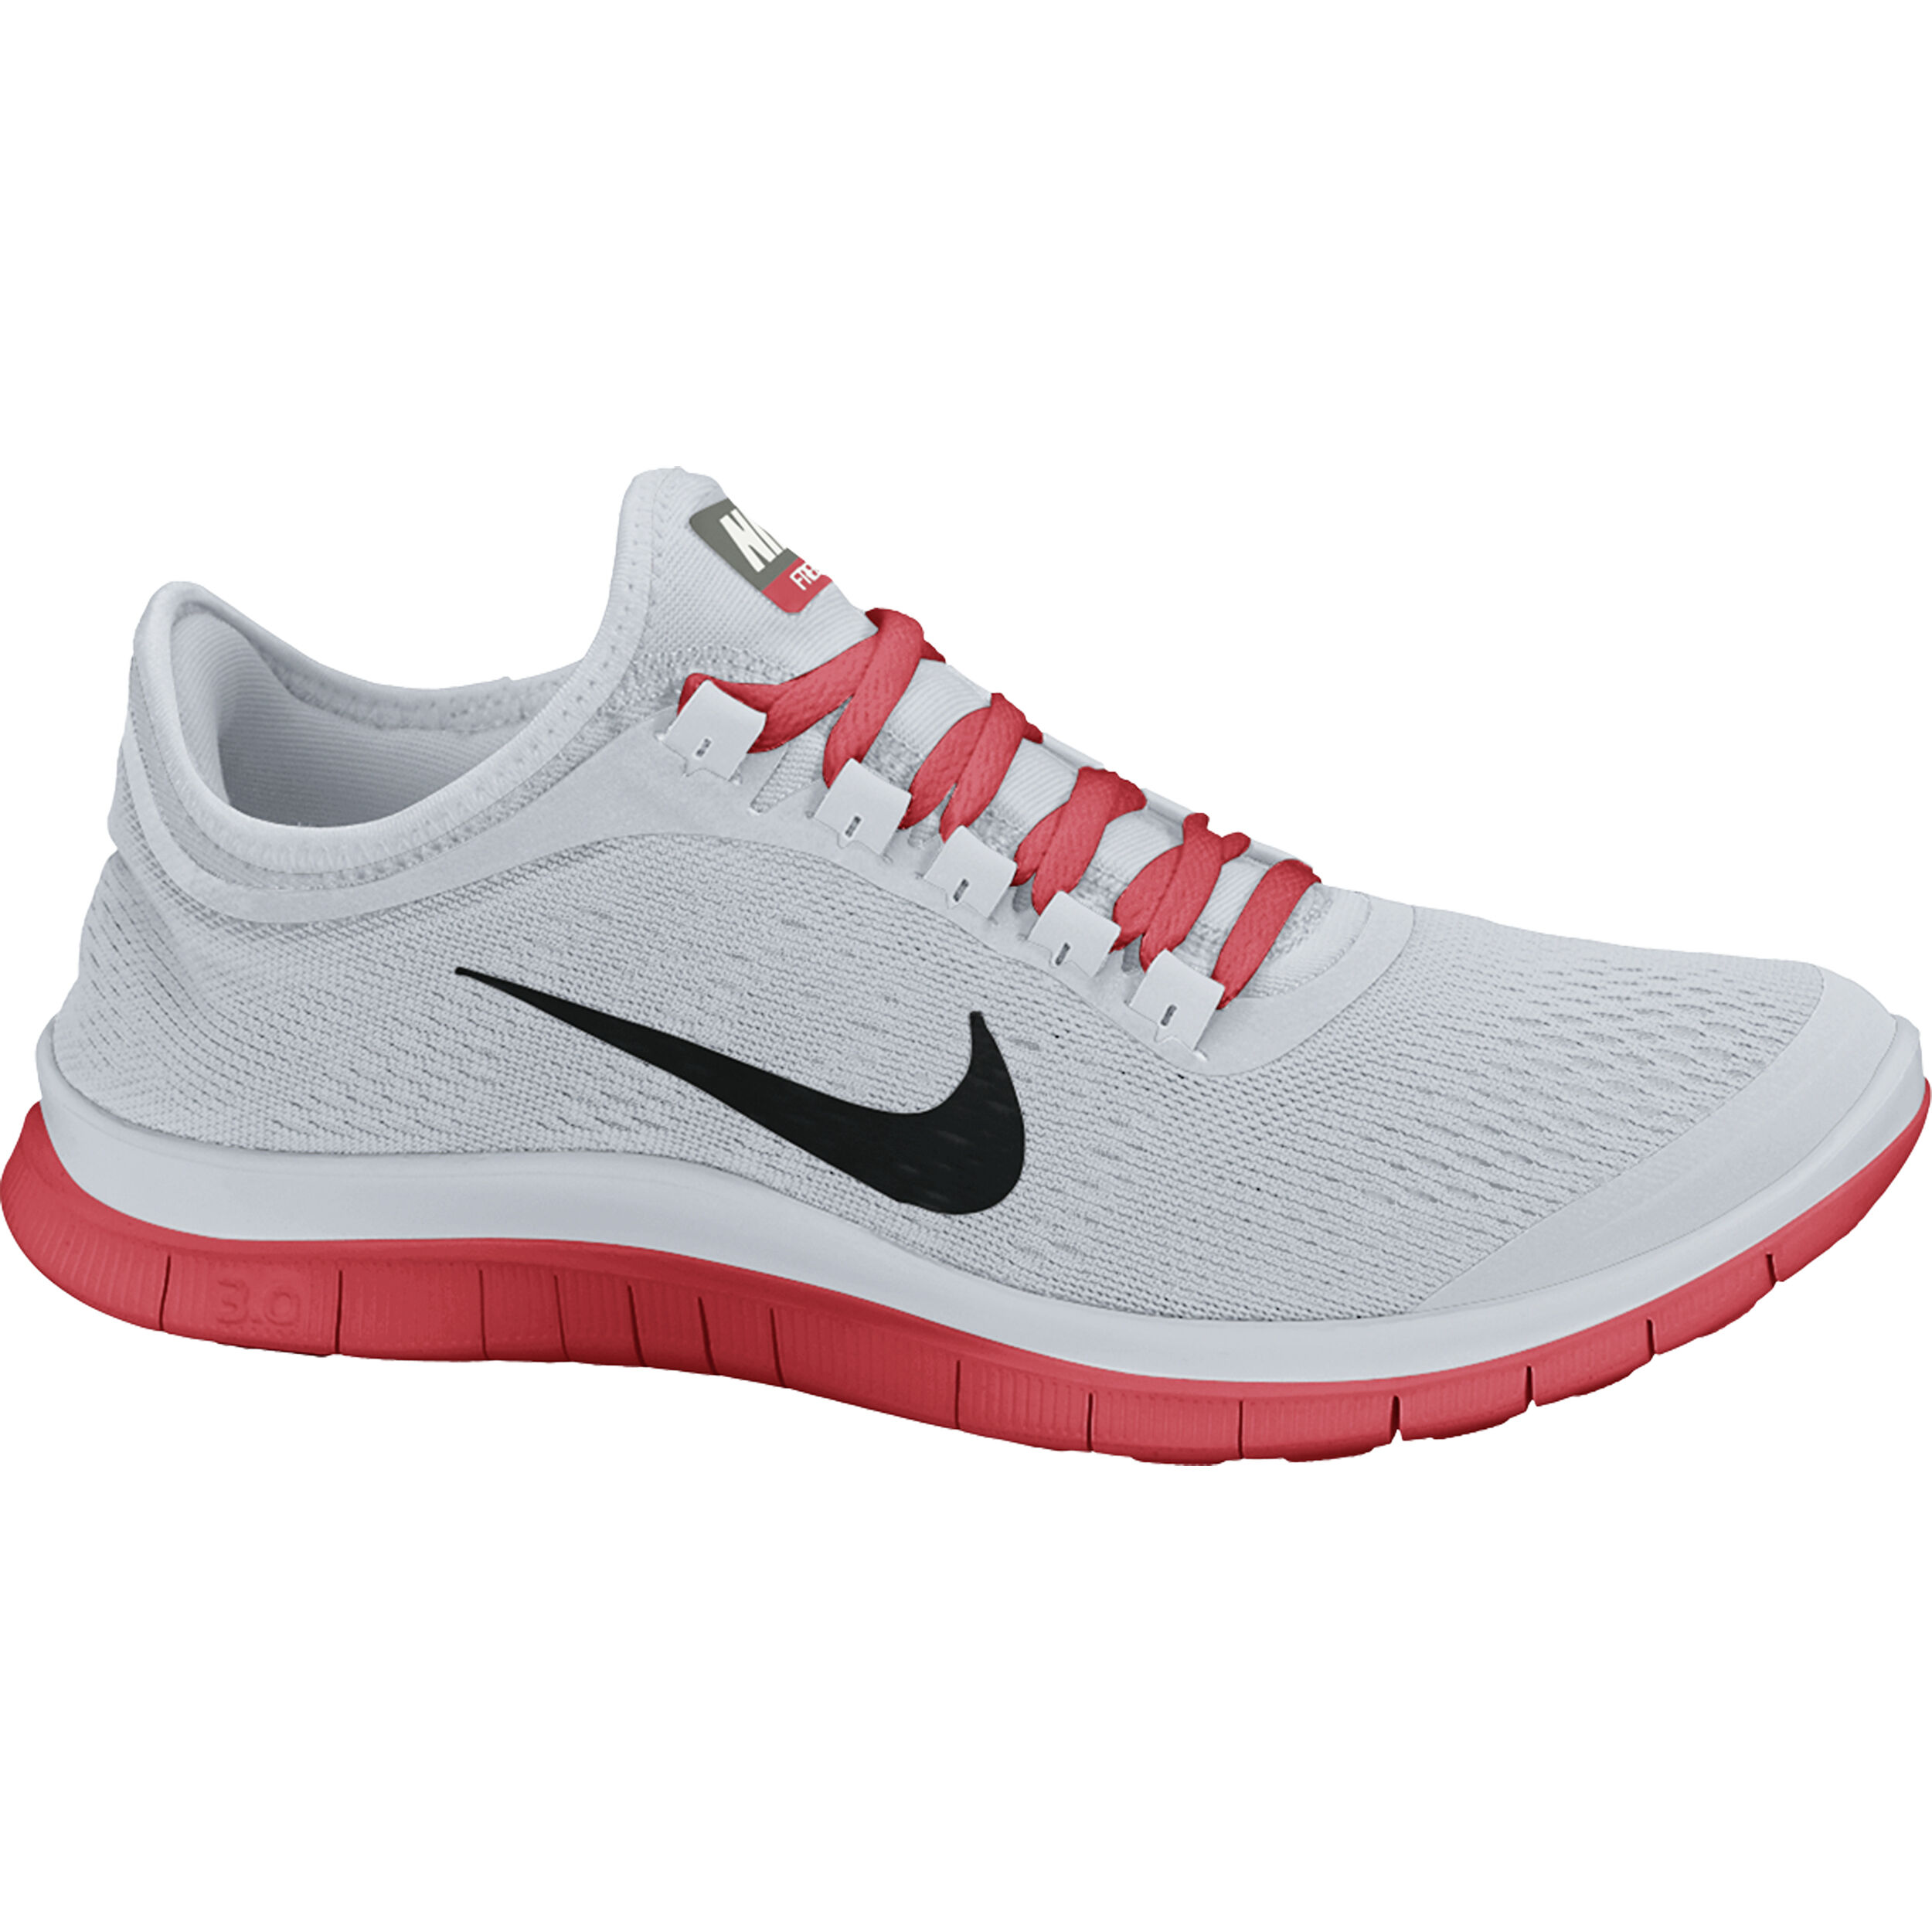 Nike Free 3.0 V5 Natural Running Schuh Herren Oliv, Rot